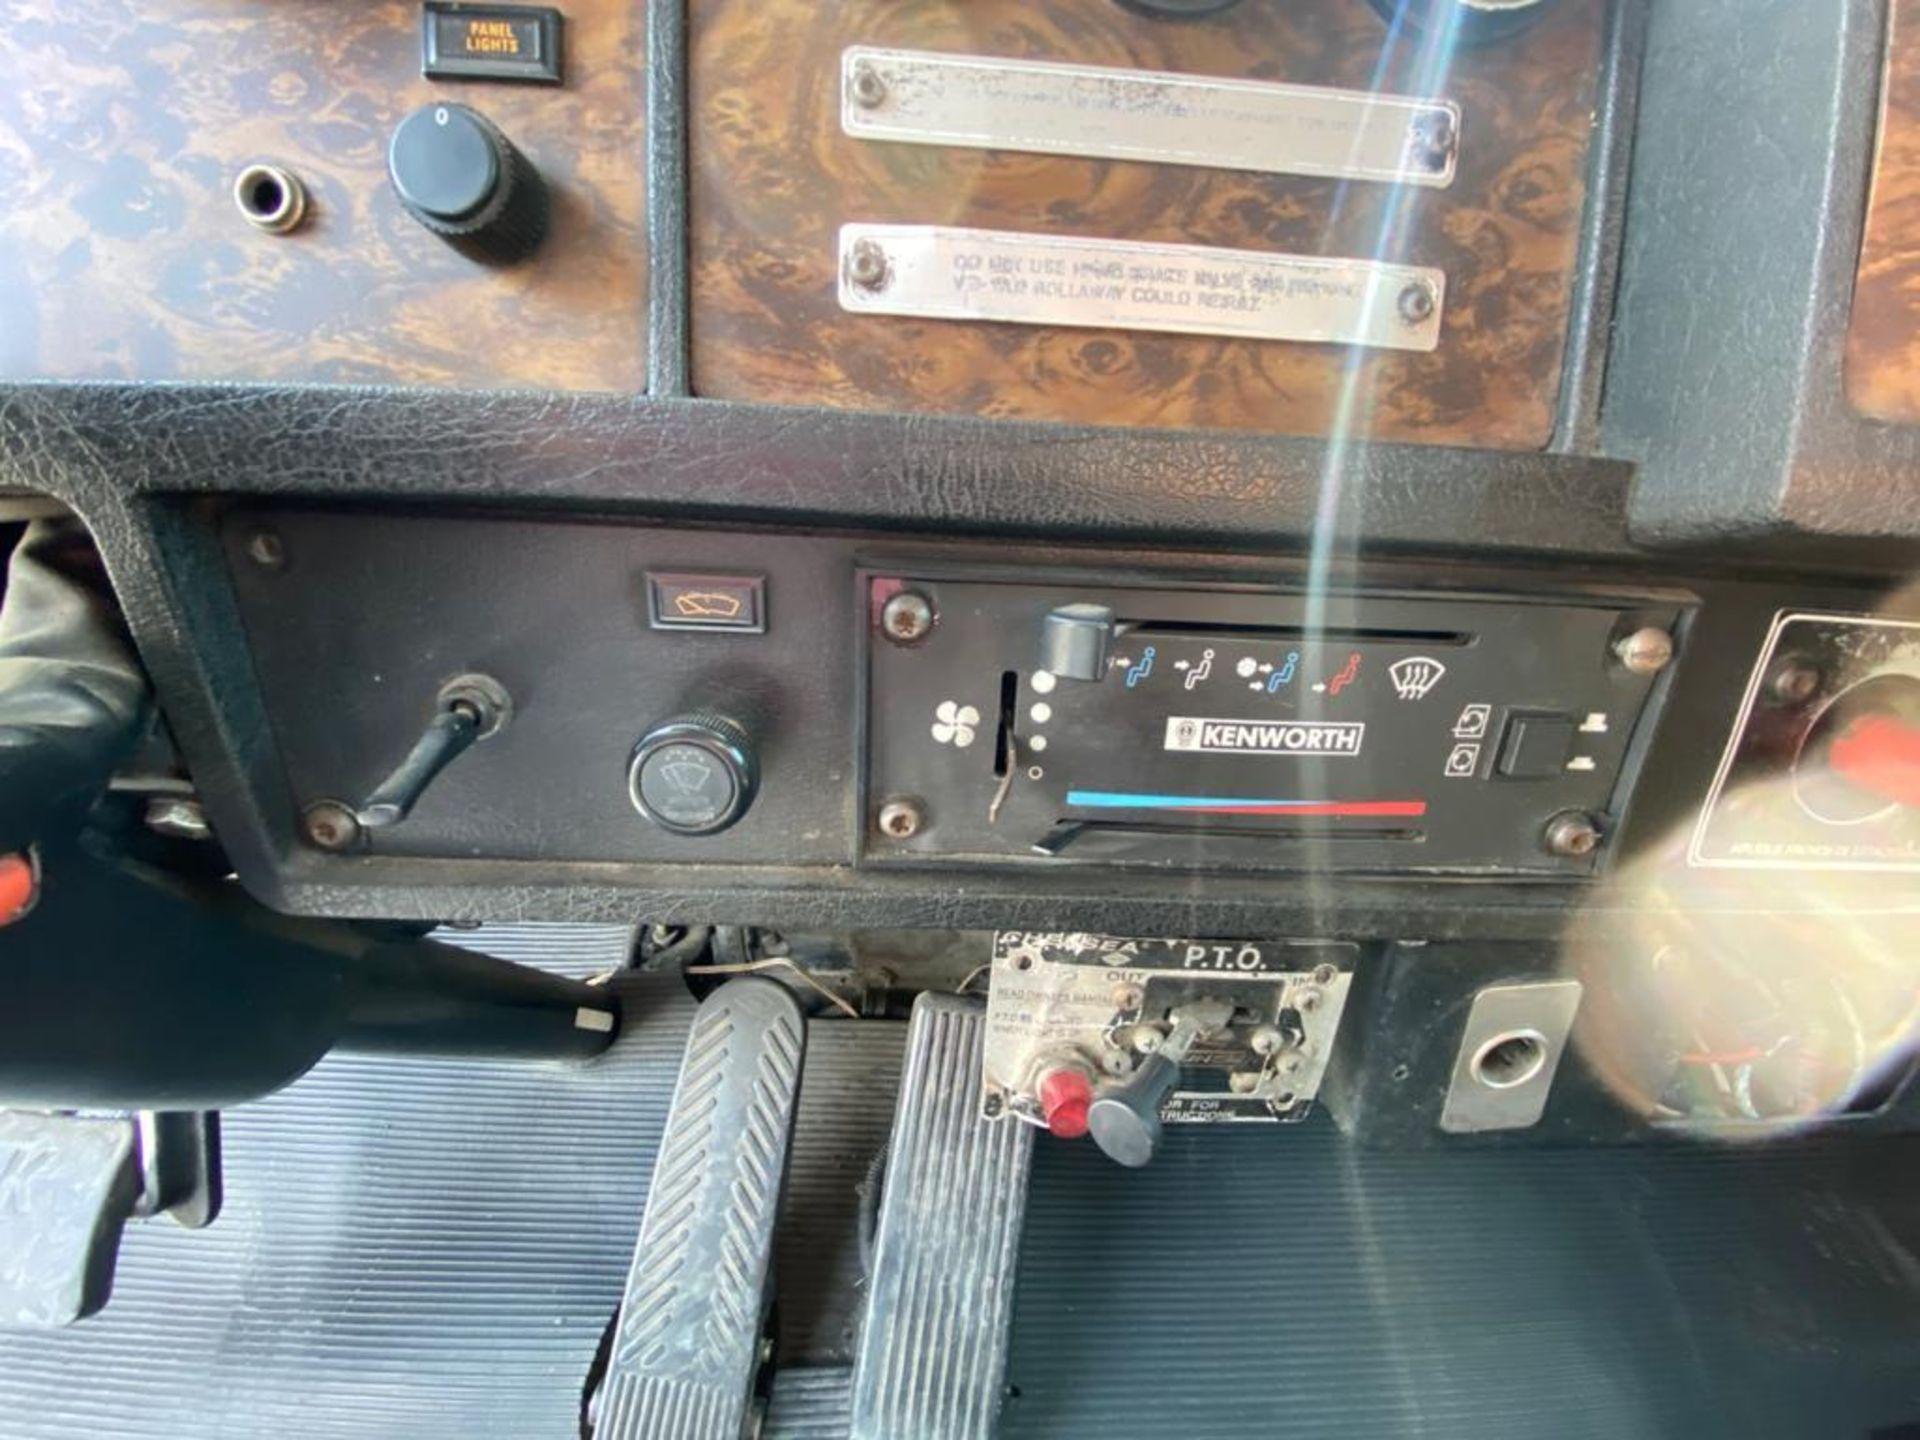 1999 Kenworth Sleeper truck tractor, standard transmission of 18 speeds - Image 39 of 72